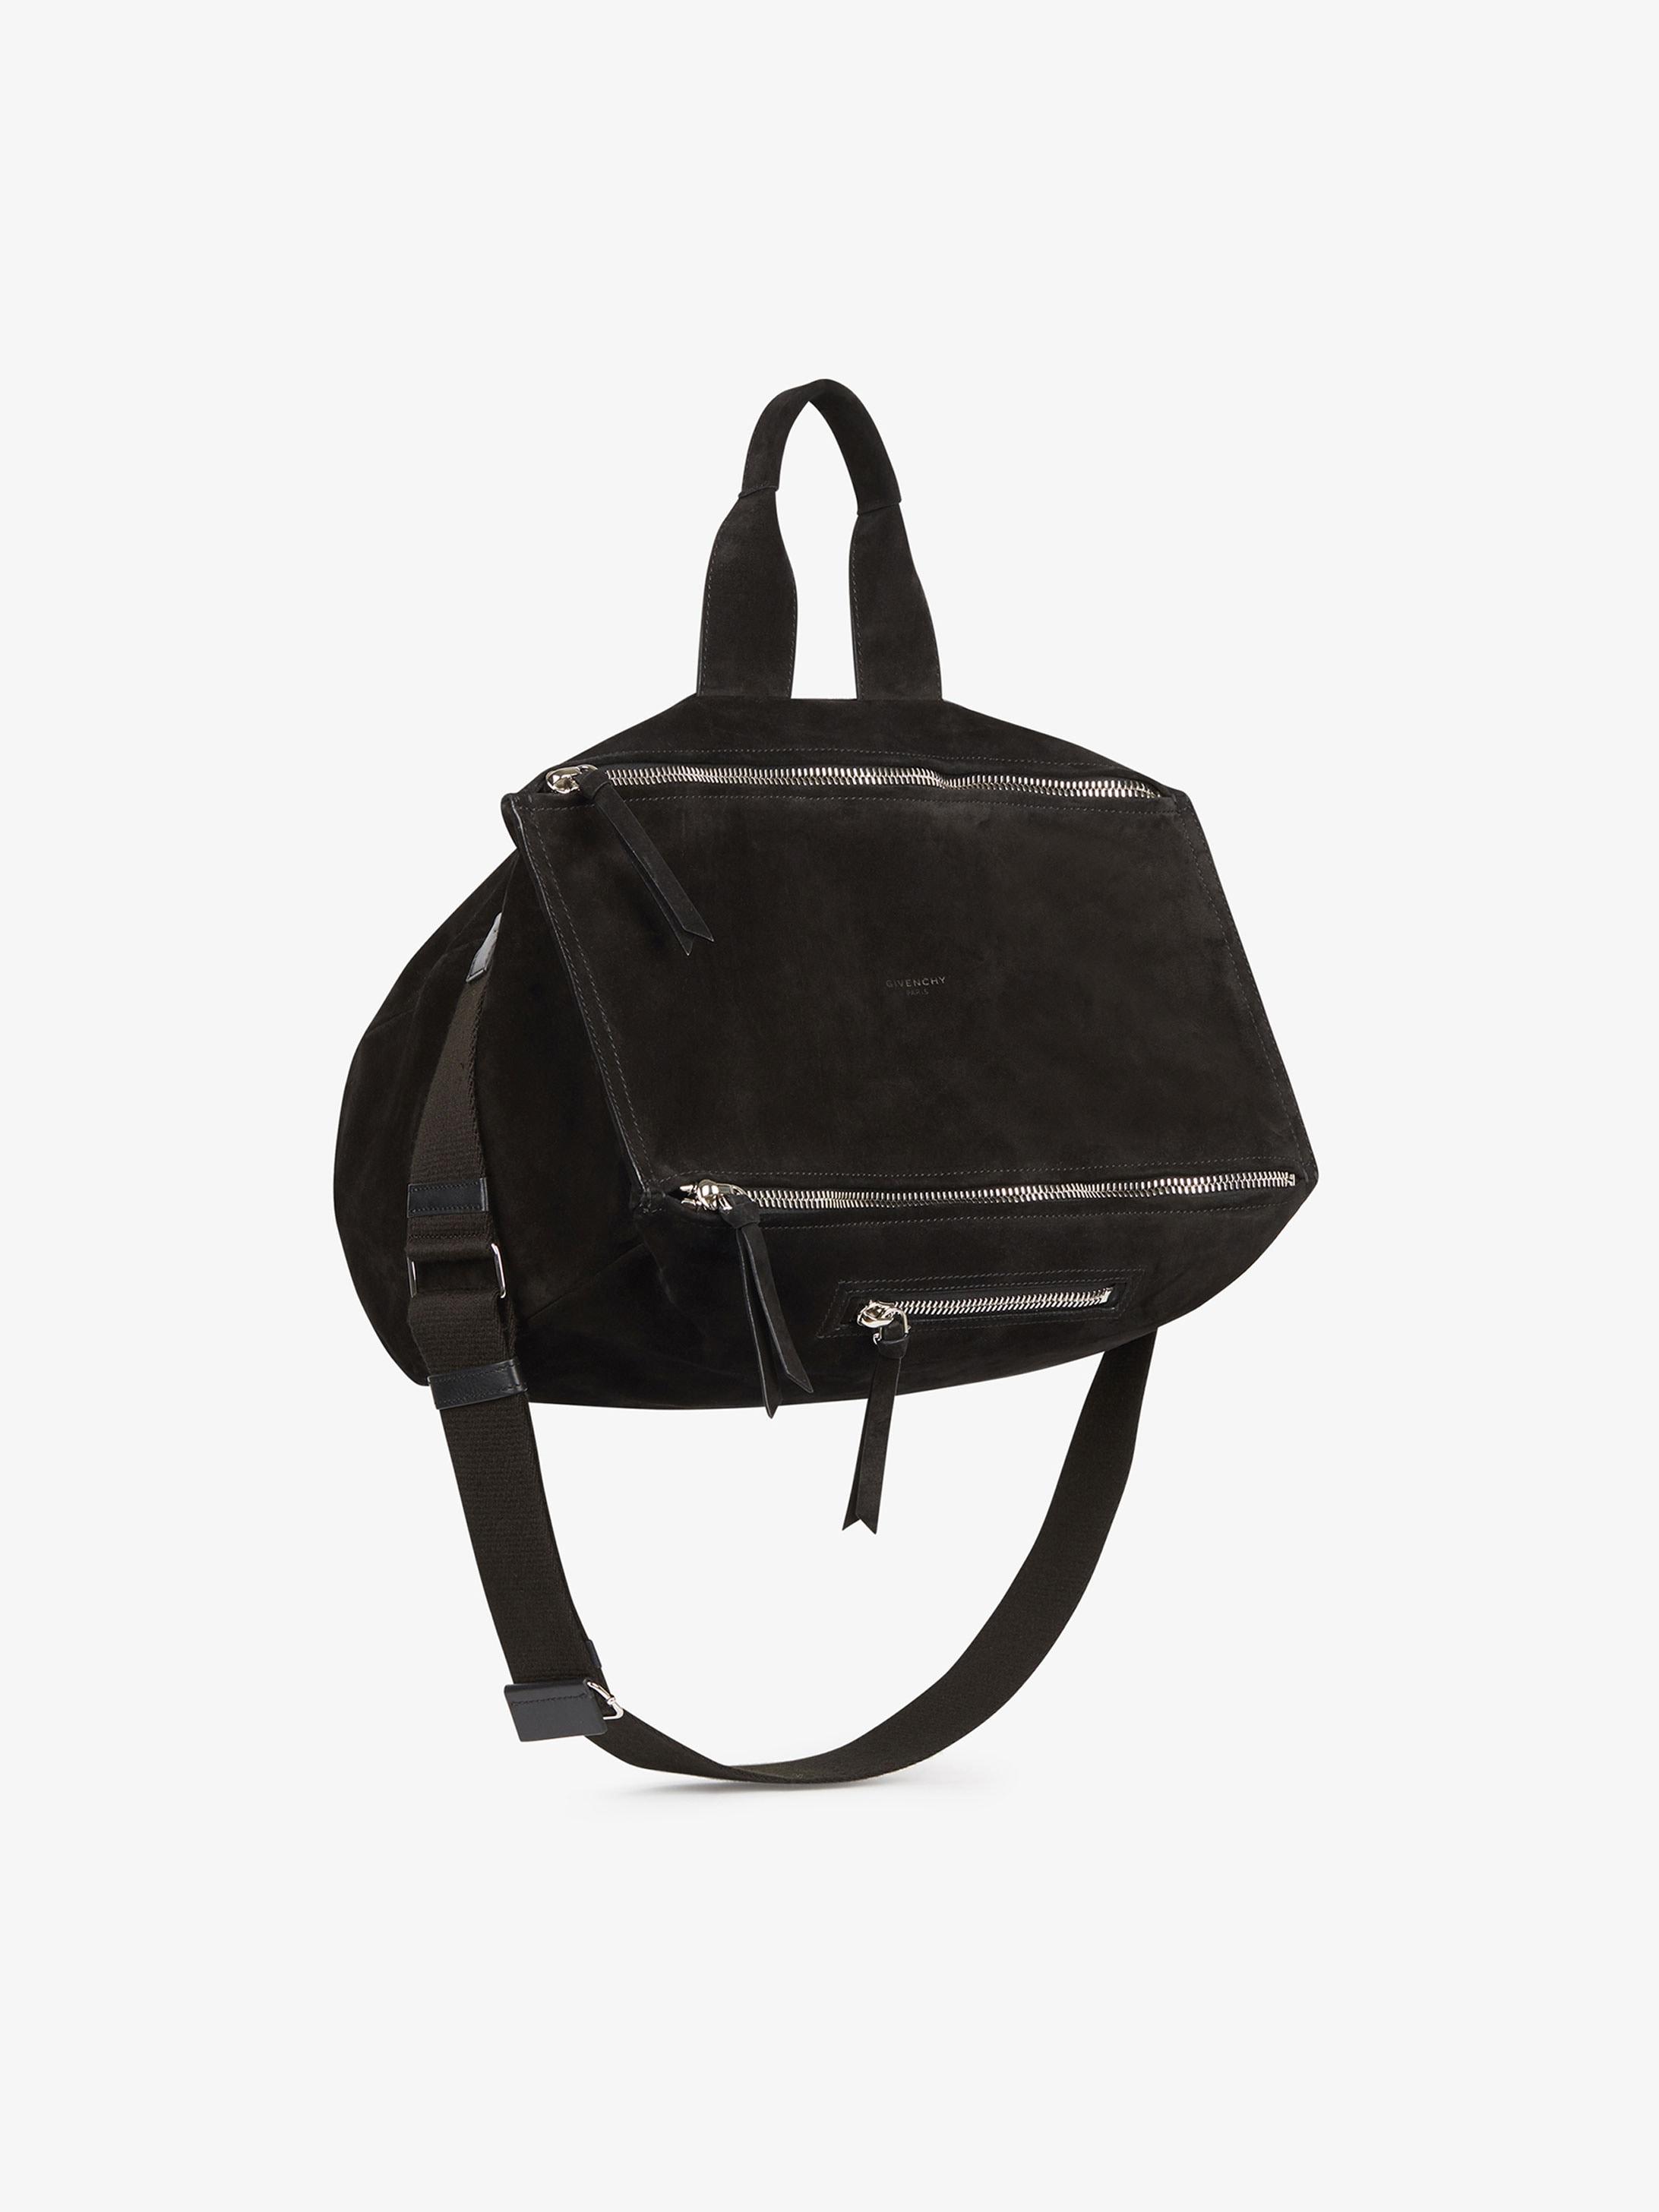 0823b74808 Givenchy Pandora messenger bag in suede